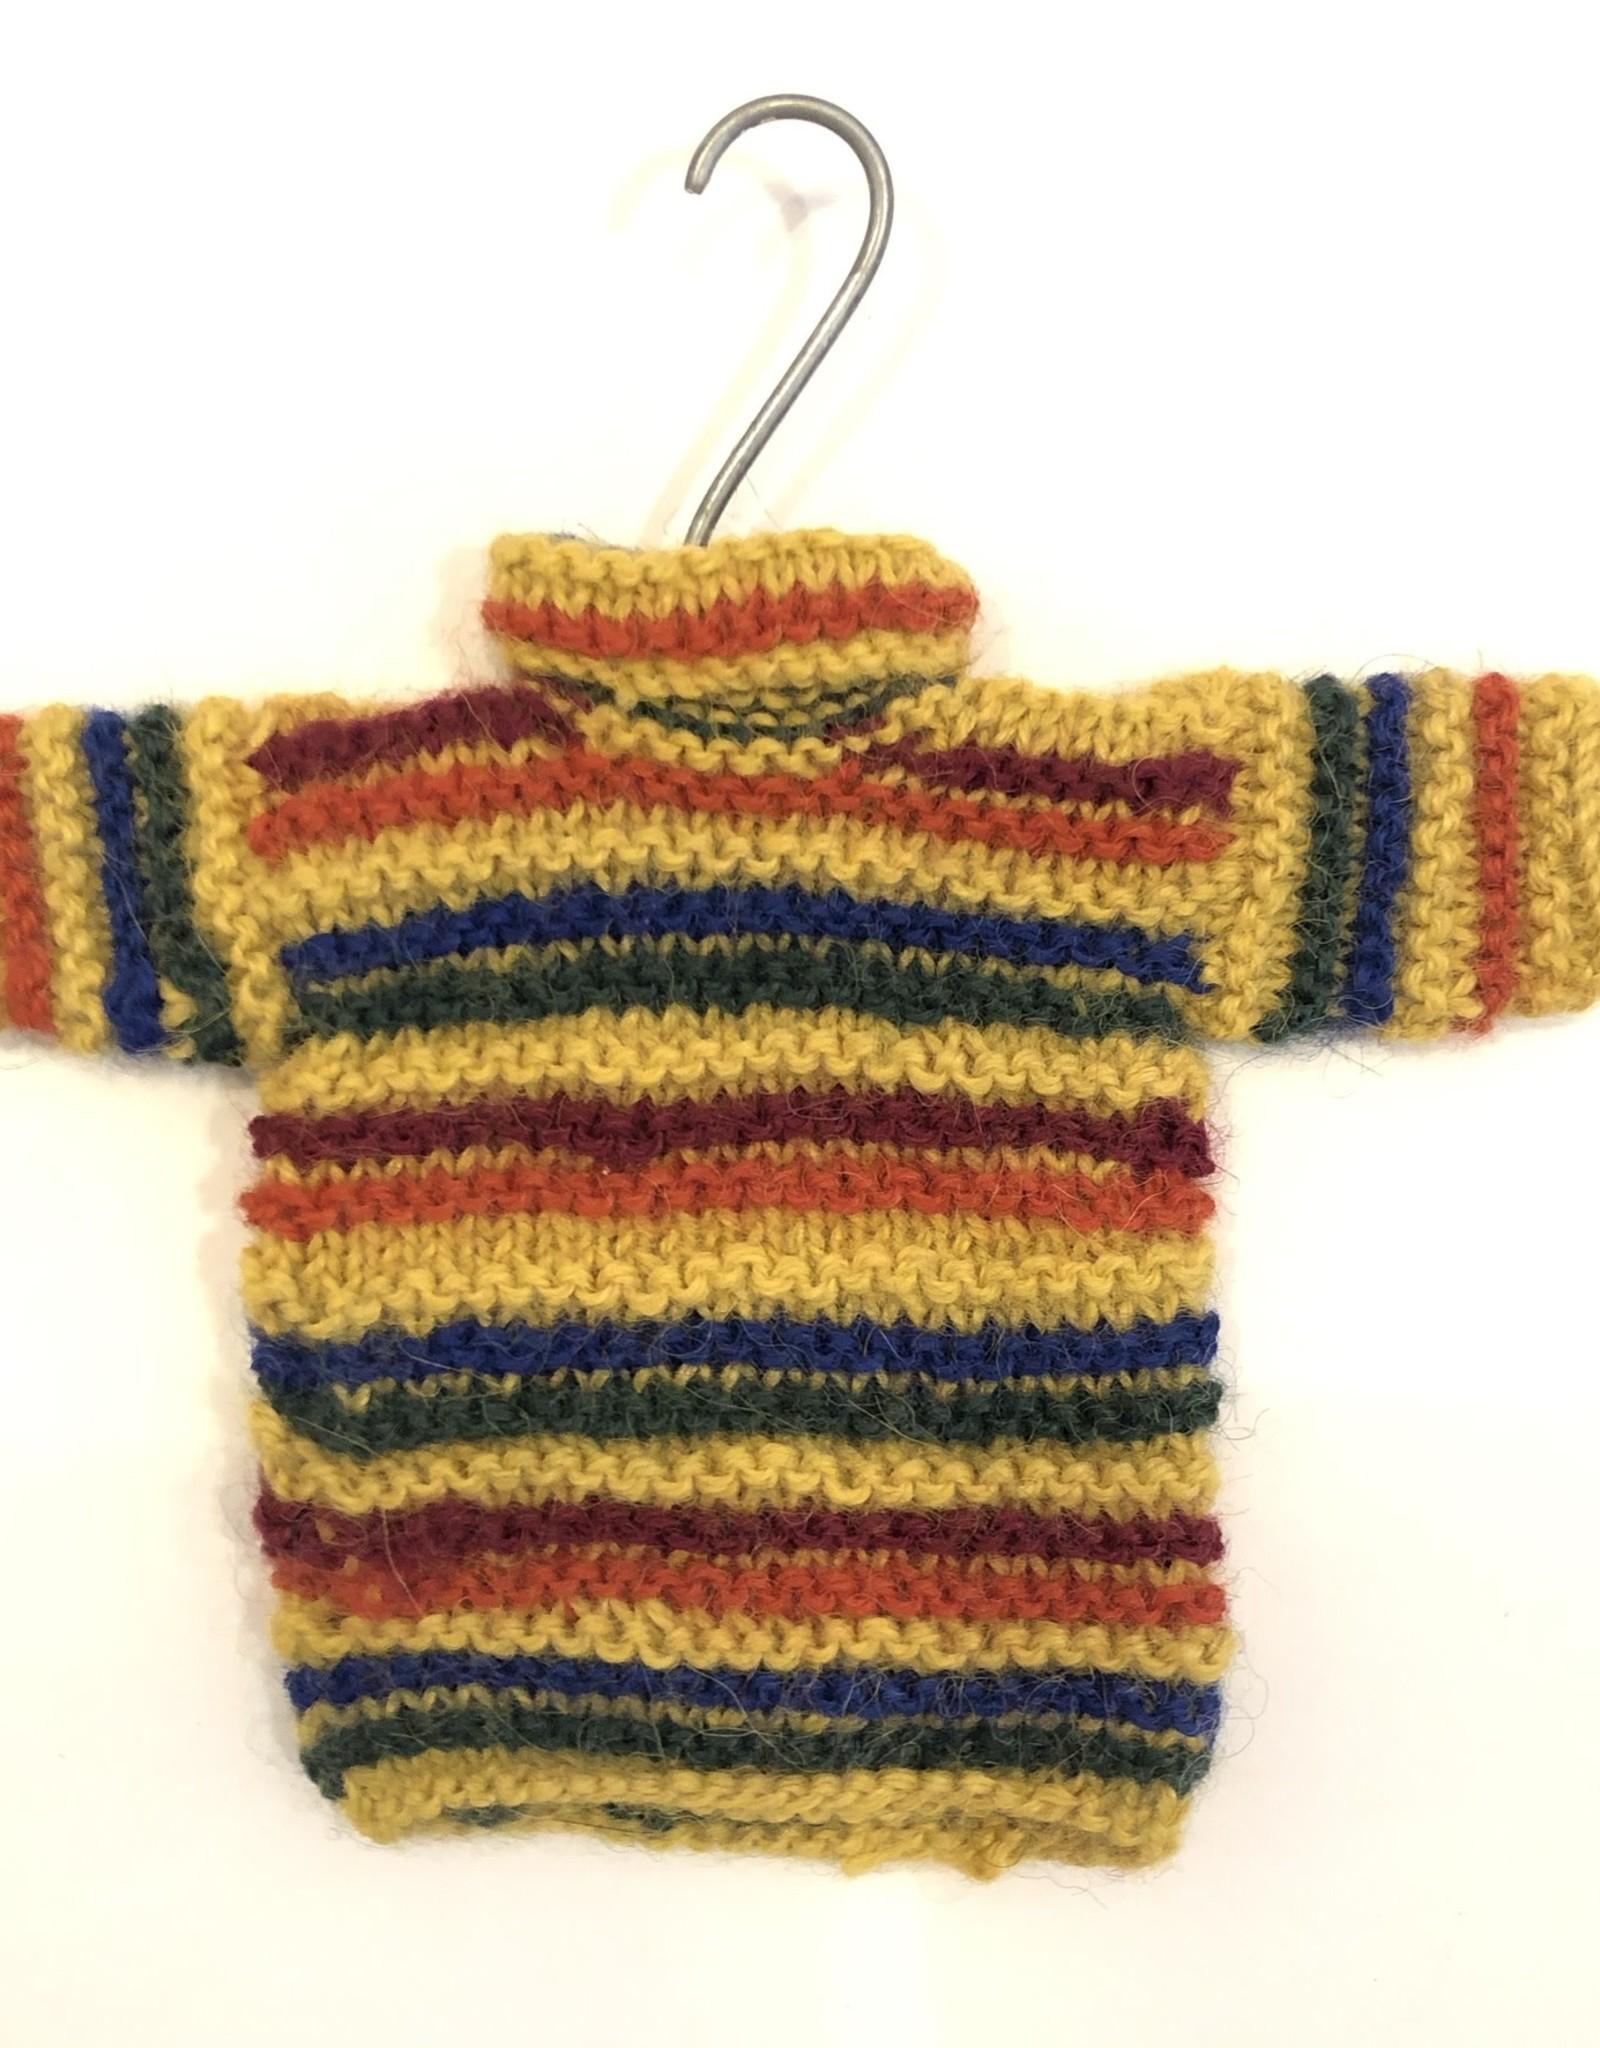 Ten Thousand Villages Handknit Sweater Ornament Gold Assorted